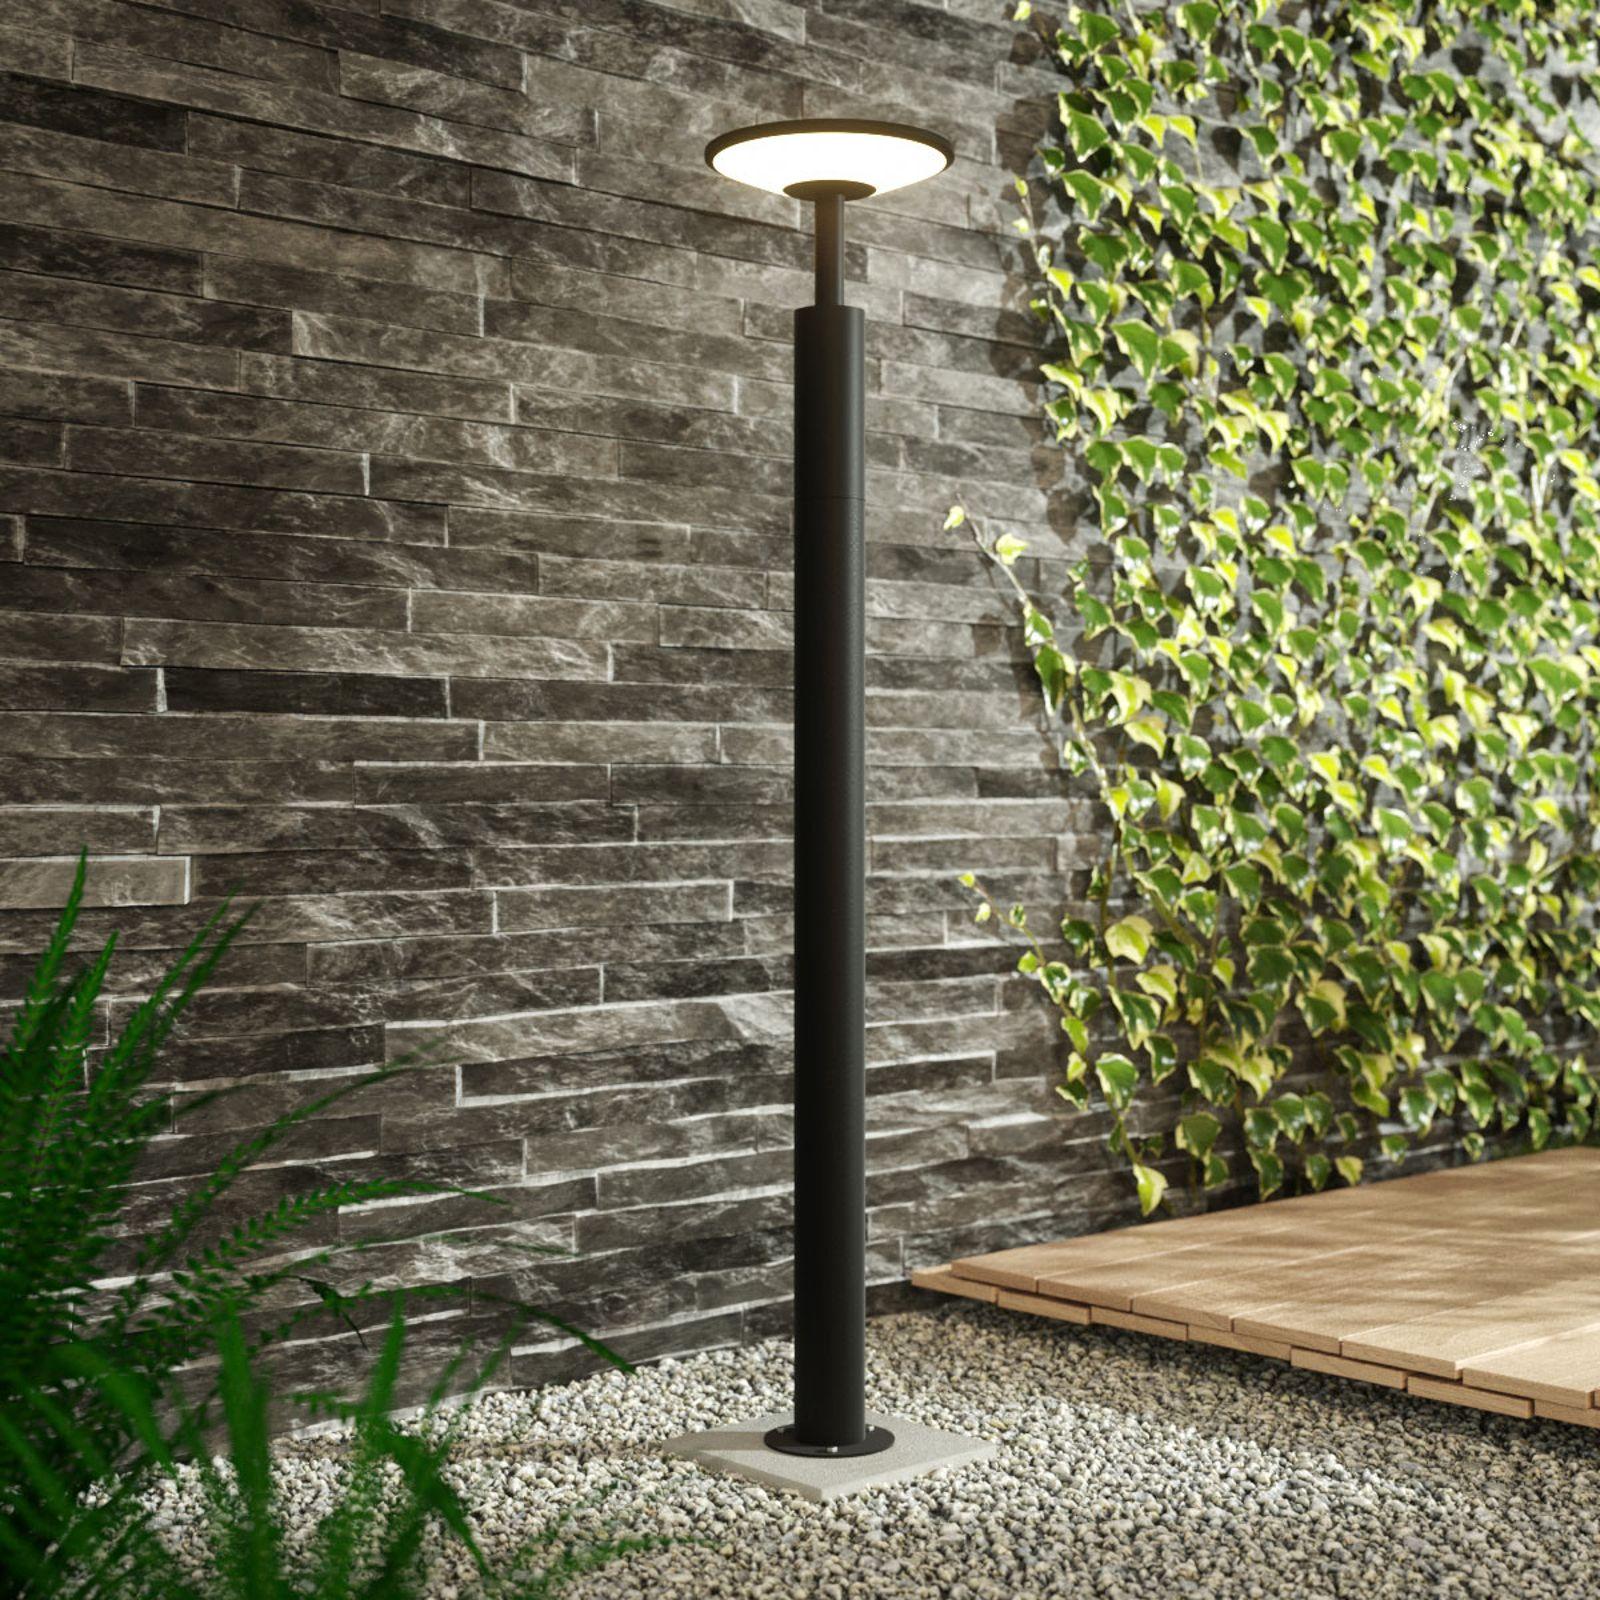 Lampioncino A Led Fenia Alto 100 Cm Di Lucande Bewegungsmelder Laterne Garten Led Stehlampe